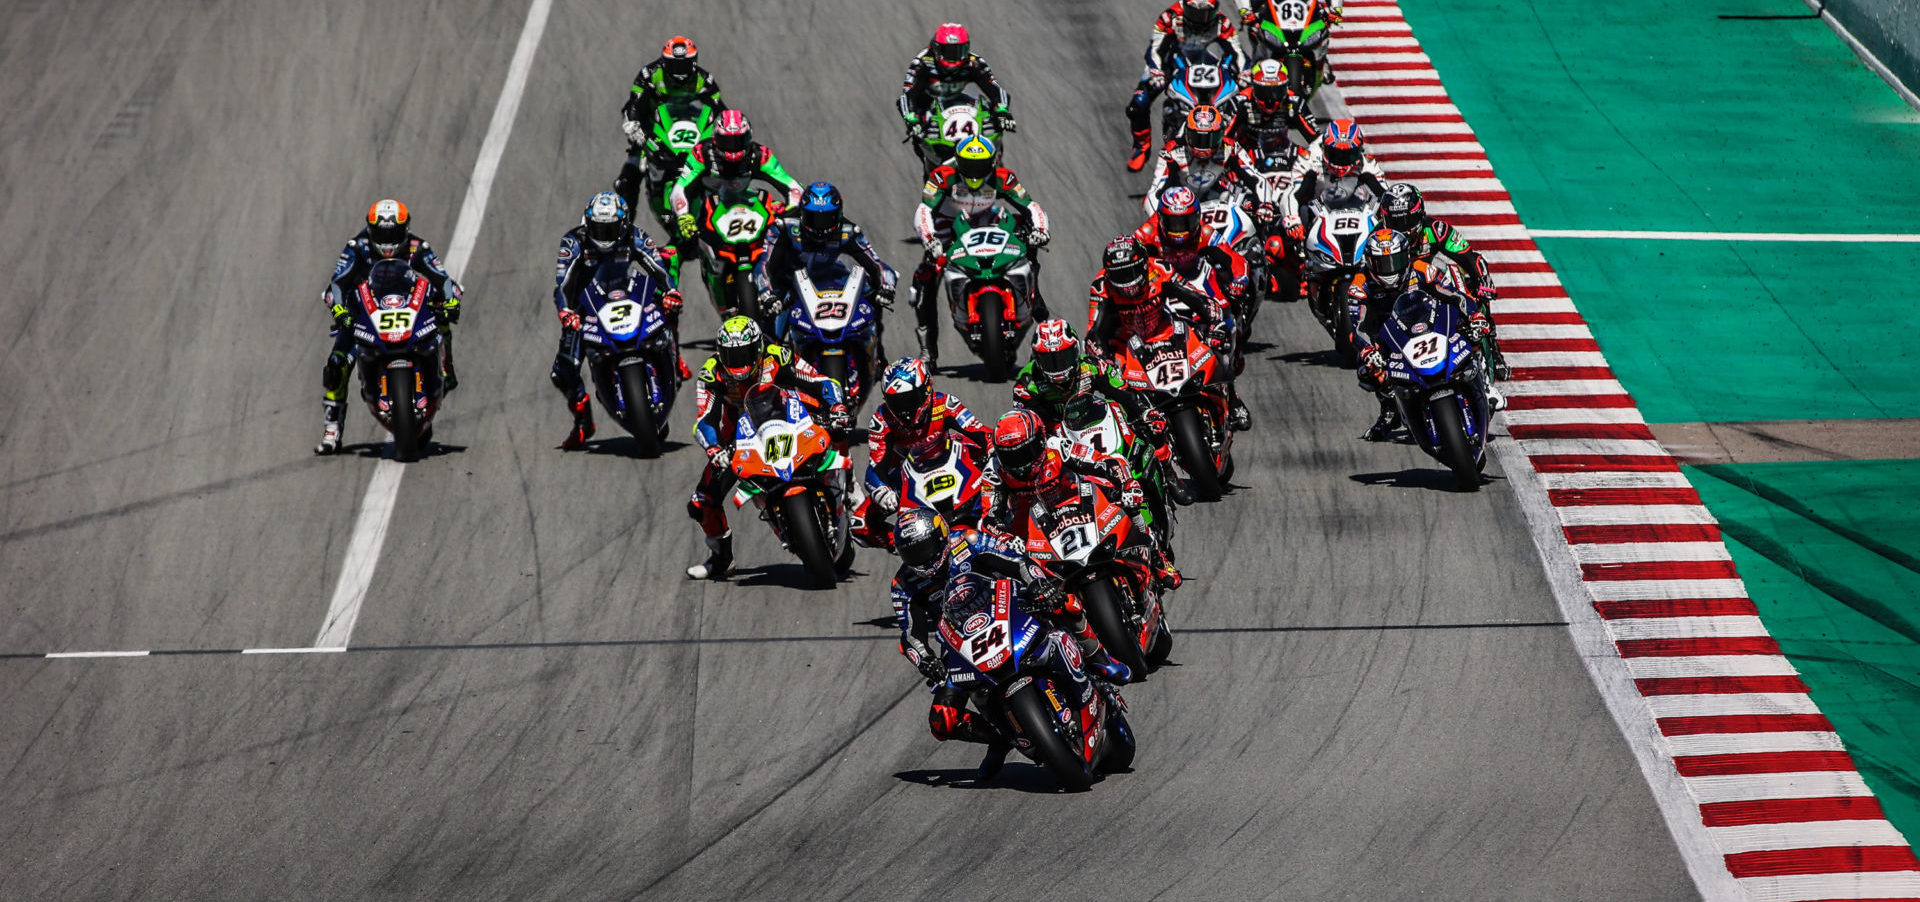 The start of a World Superbike race at Catalunya. Photo courtesy Dorna.